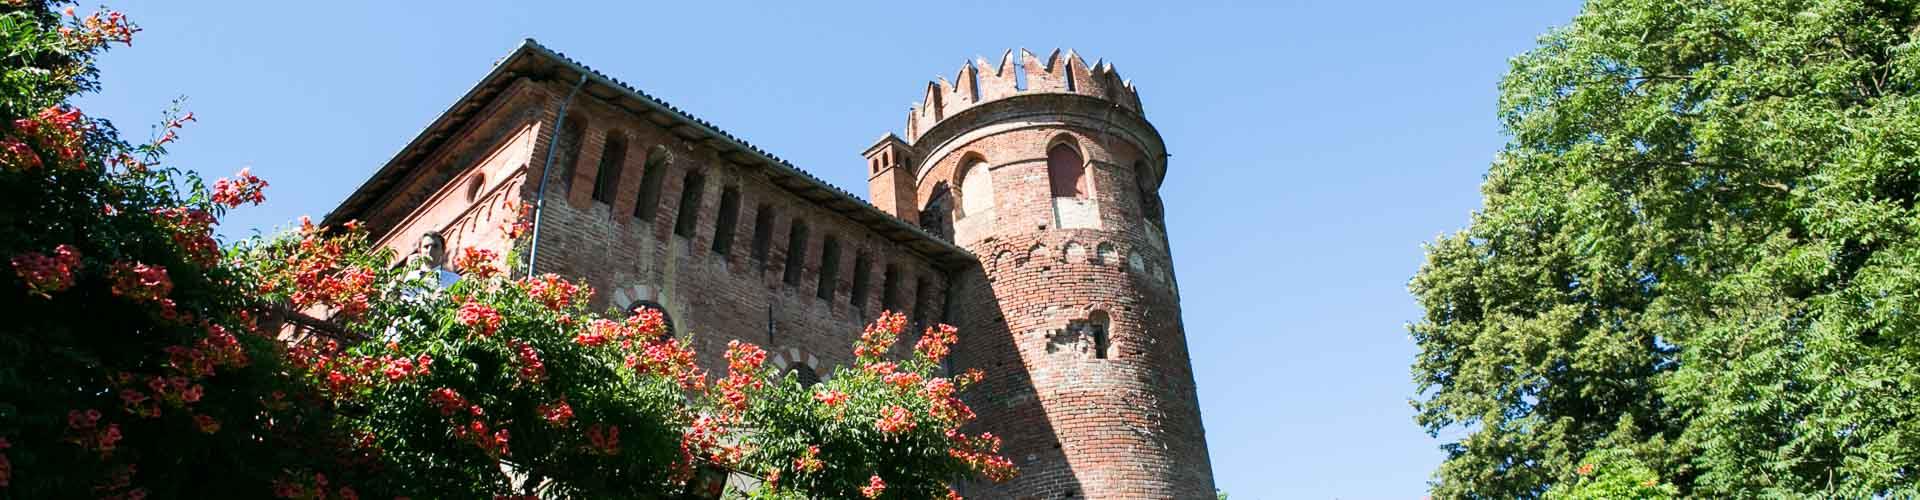 castello di redabue masio alessandria facciata